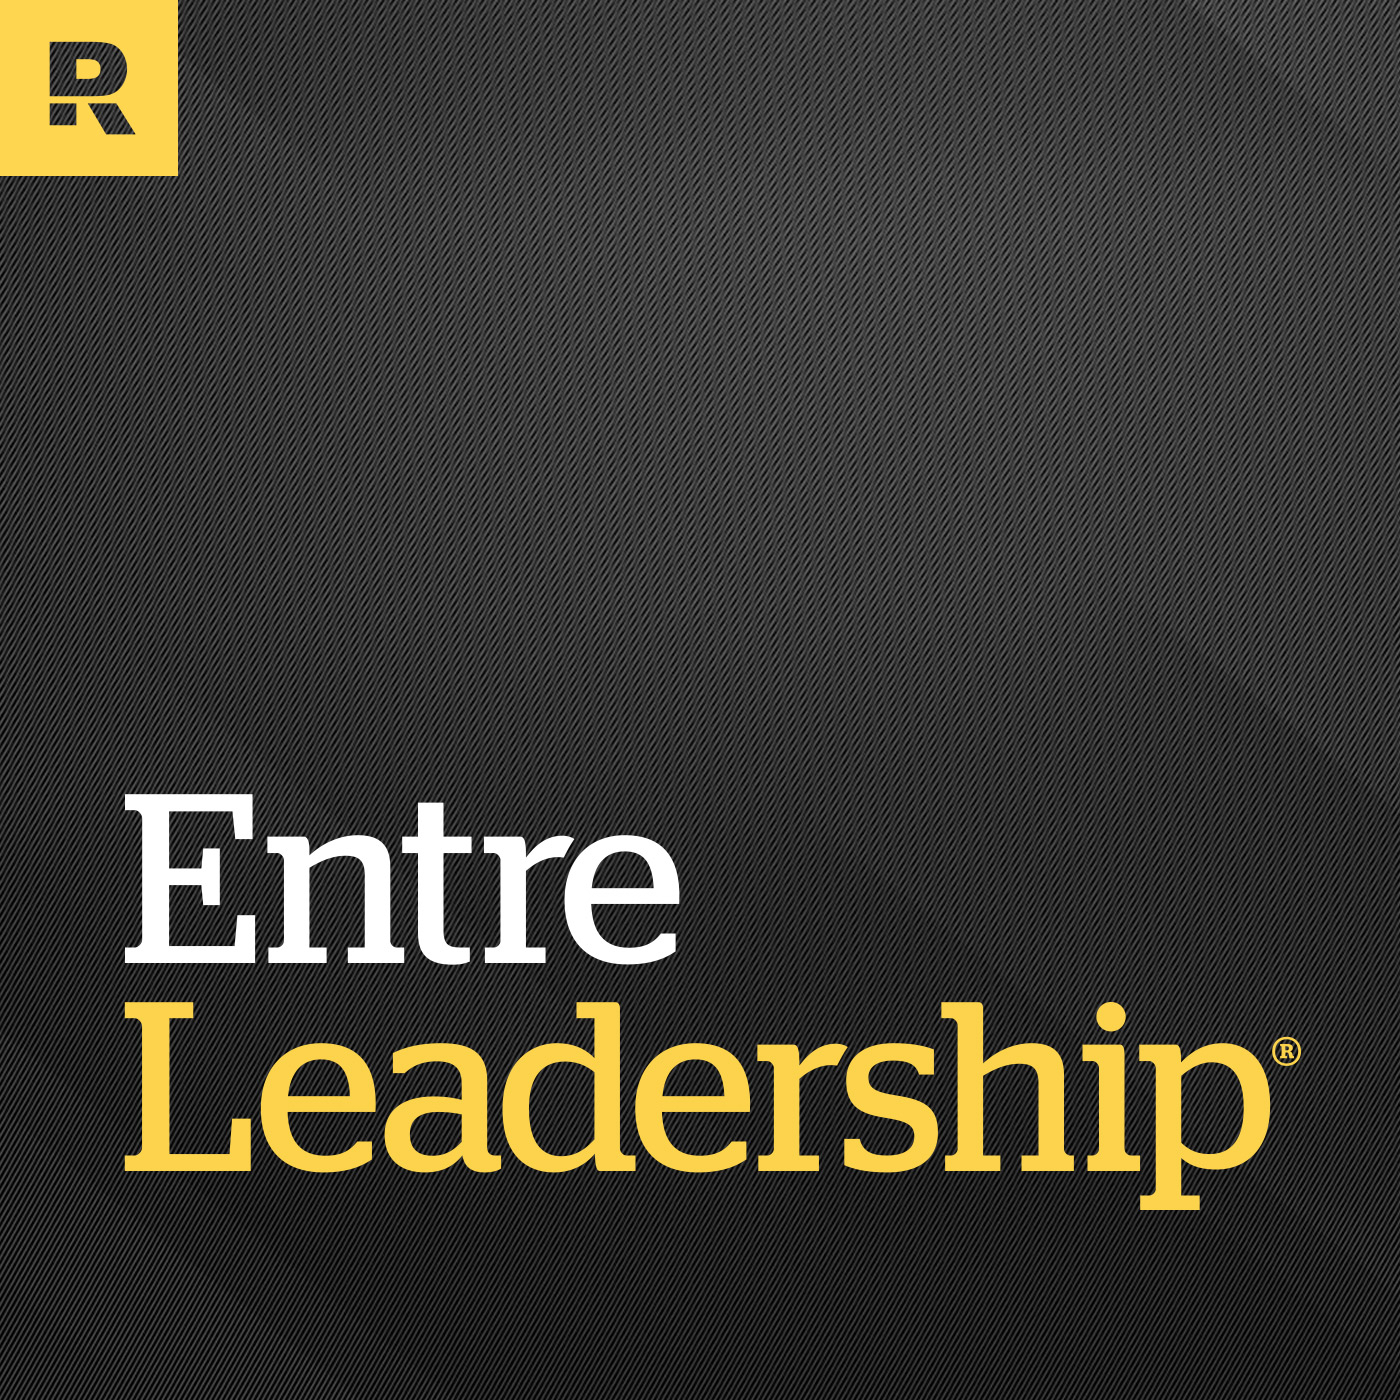 The EntreLeadership Podcast show art